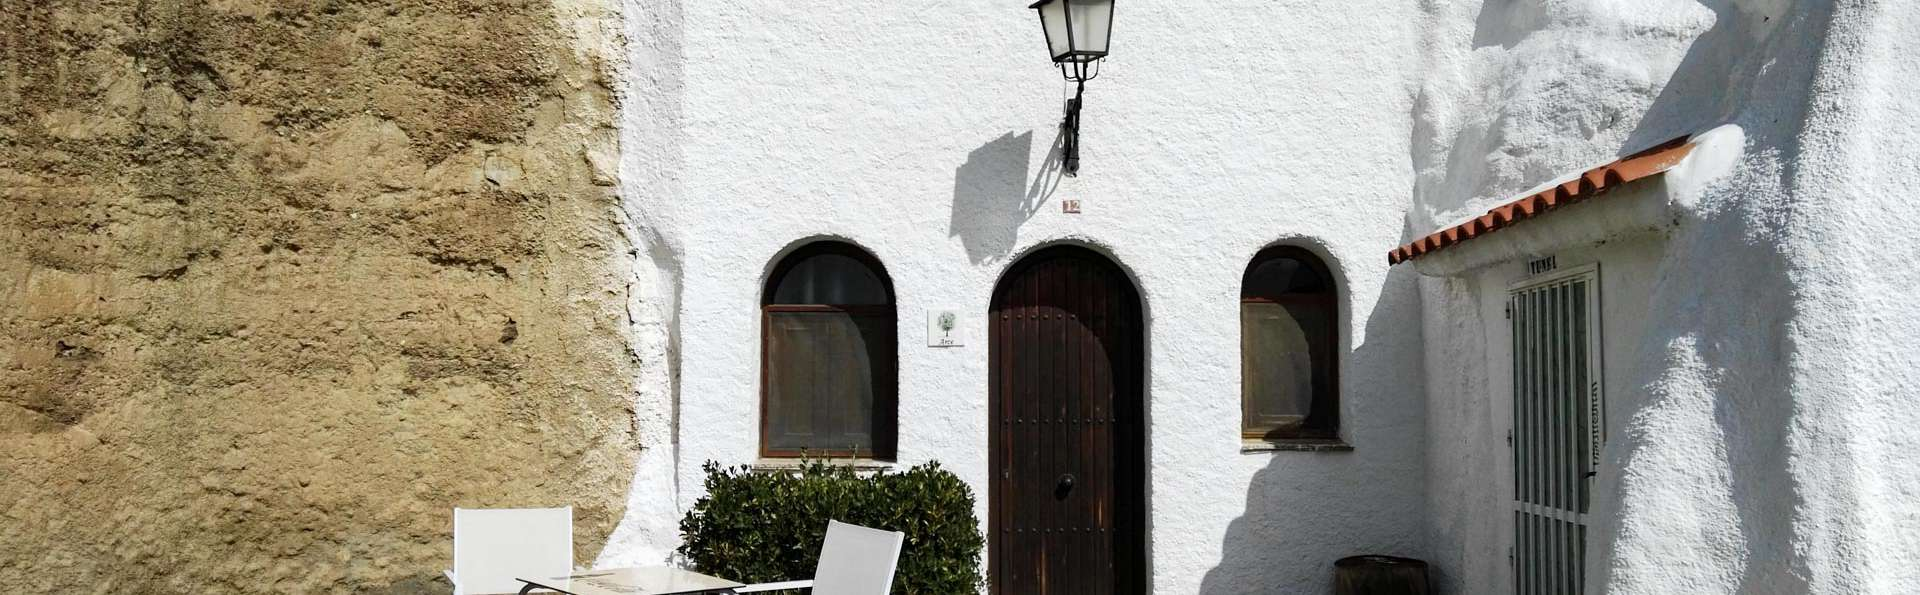 Hotel Cuevas Abuelo Ventura - EDIT_NEW_FRONT_02.jpg